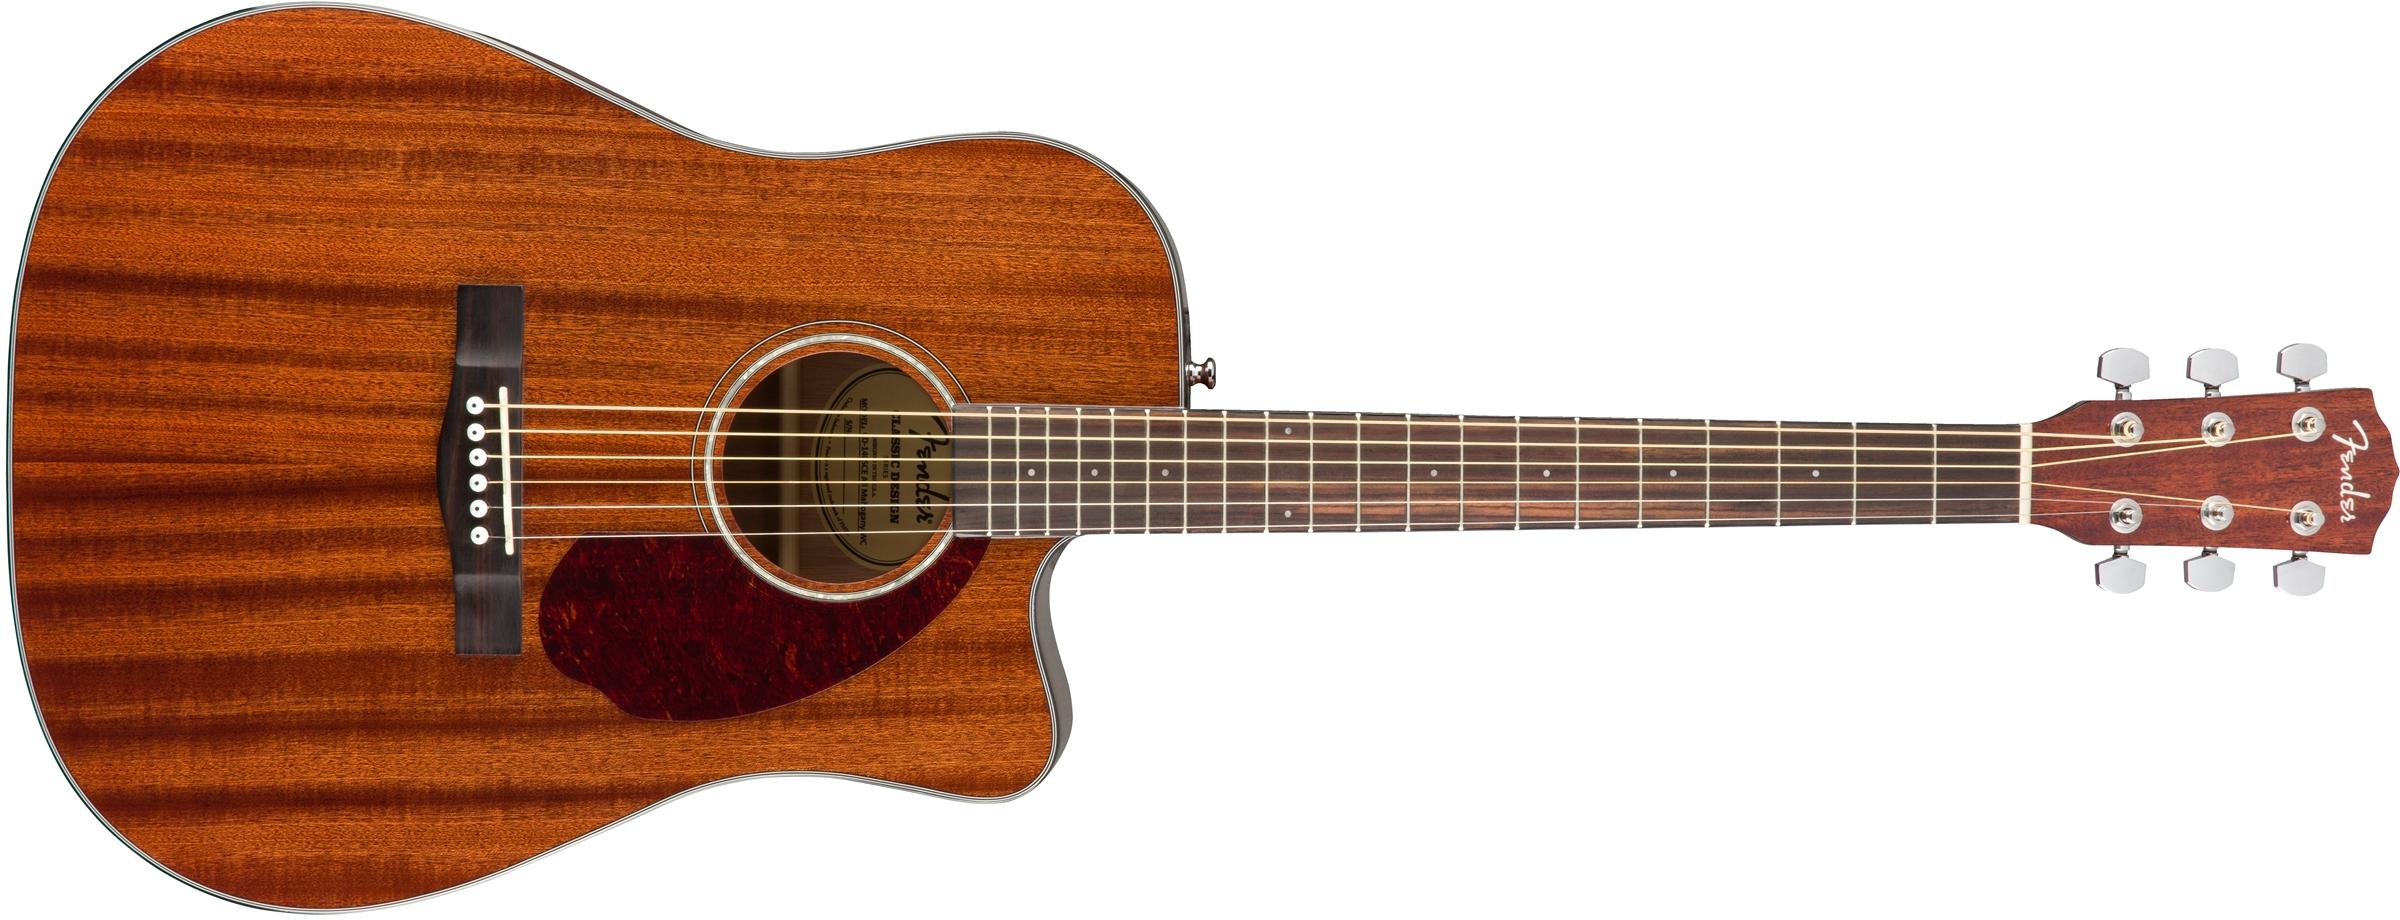 fender cd 140sce dreadnought acoustic electric guitar all mahogany 607595984243 ebay. Black Bedroom Furniture Sets. Home Design Ideas